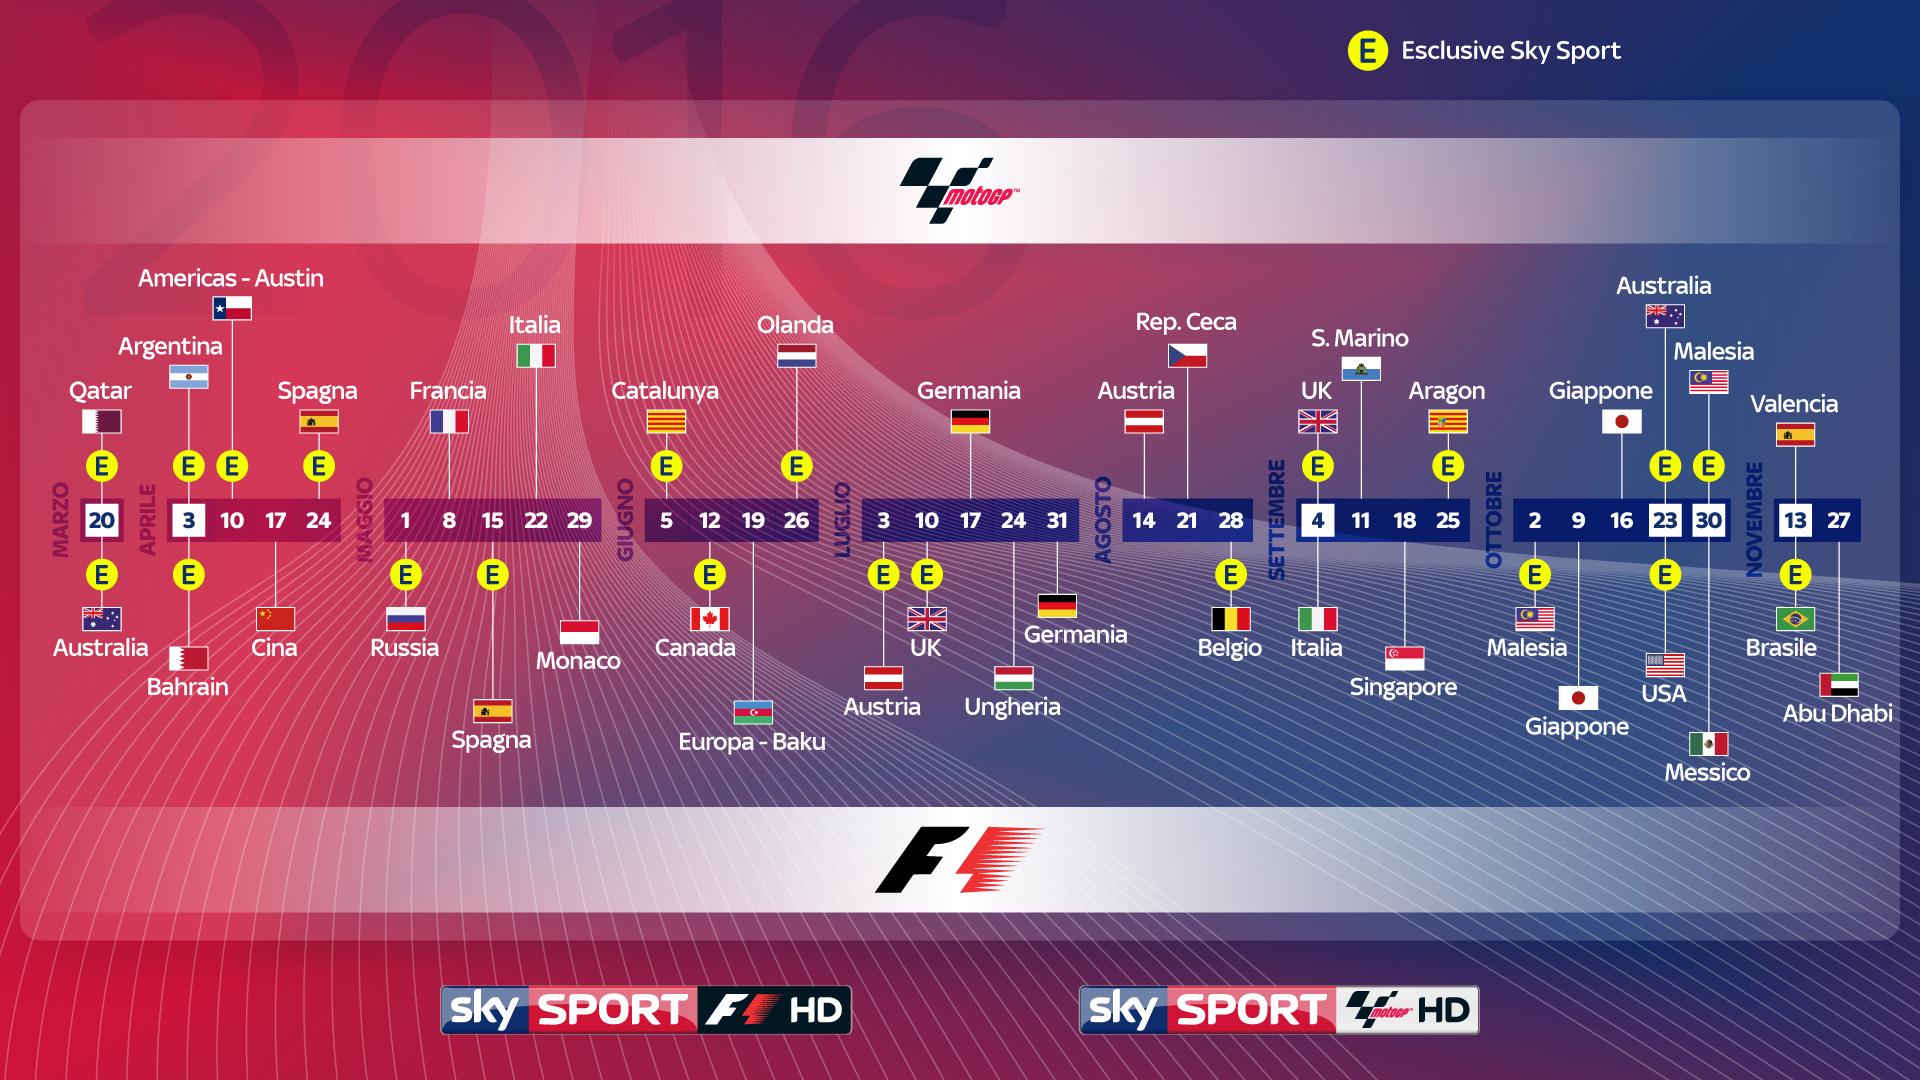 Calendario Formula1.Sky Sport F1 Hd Si Prepara Al Mondiale Di Formula 1 2016